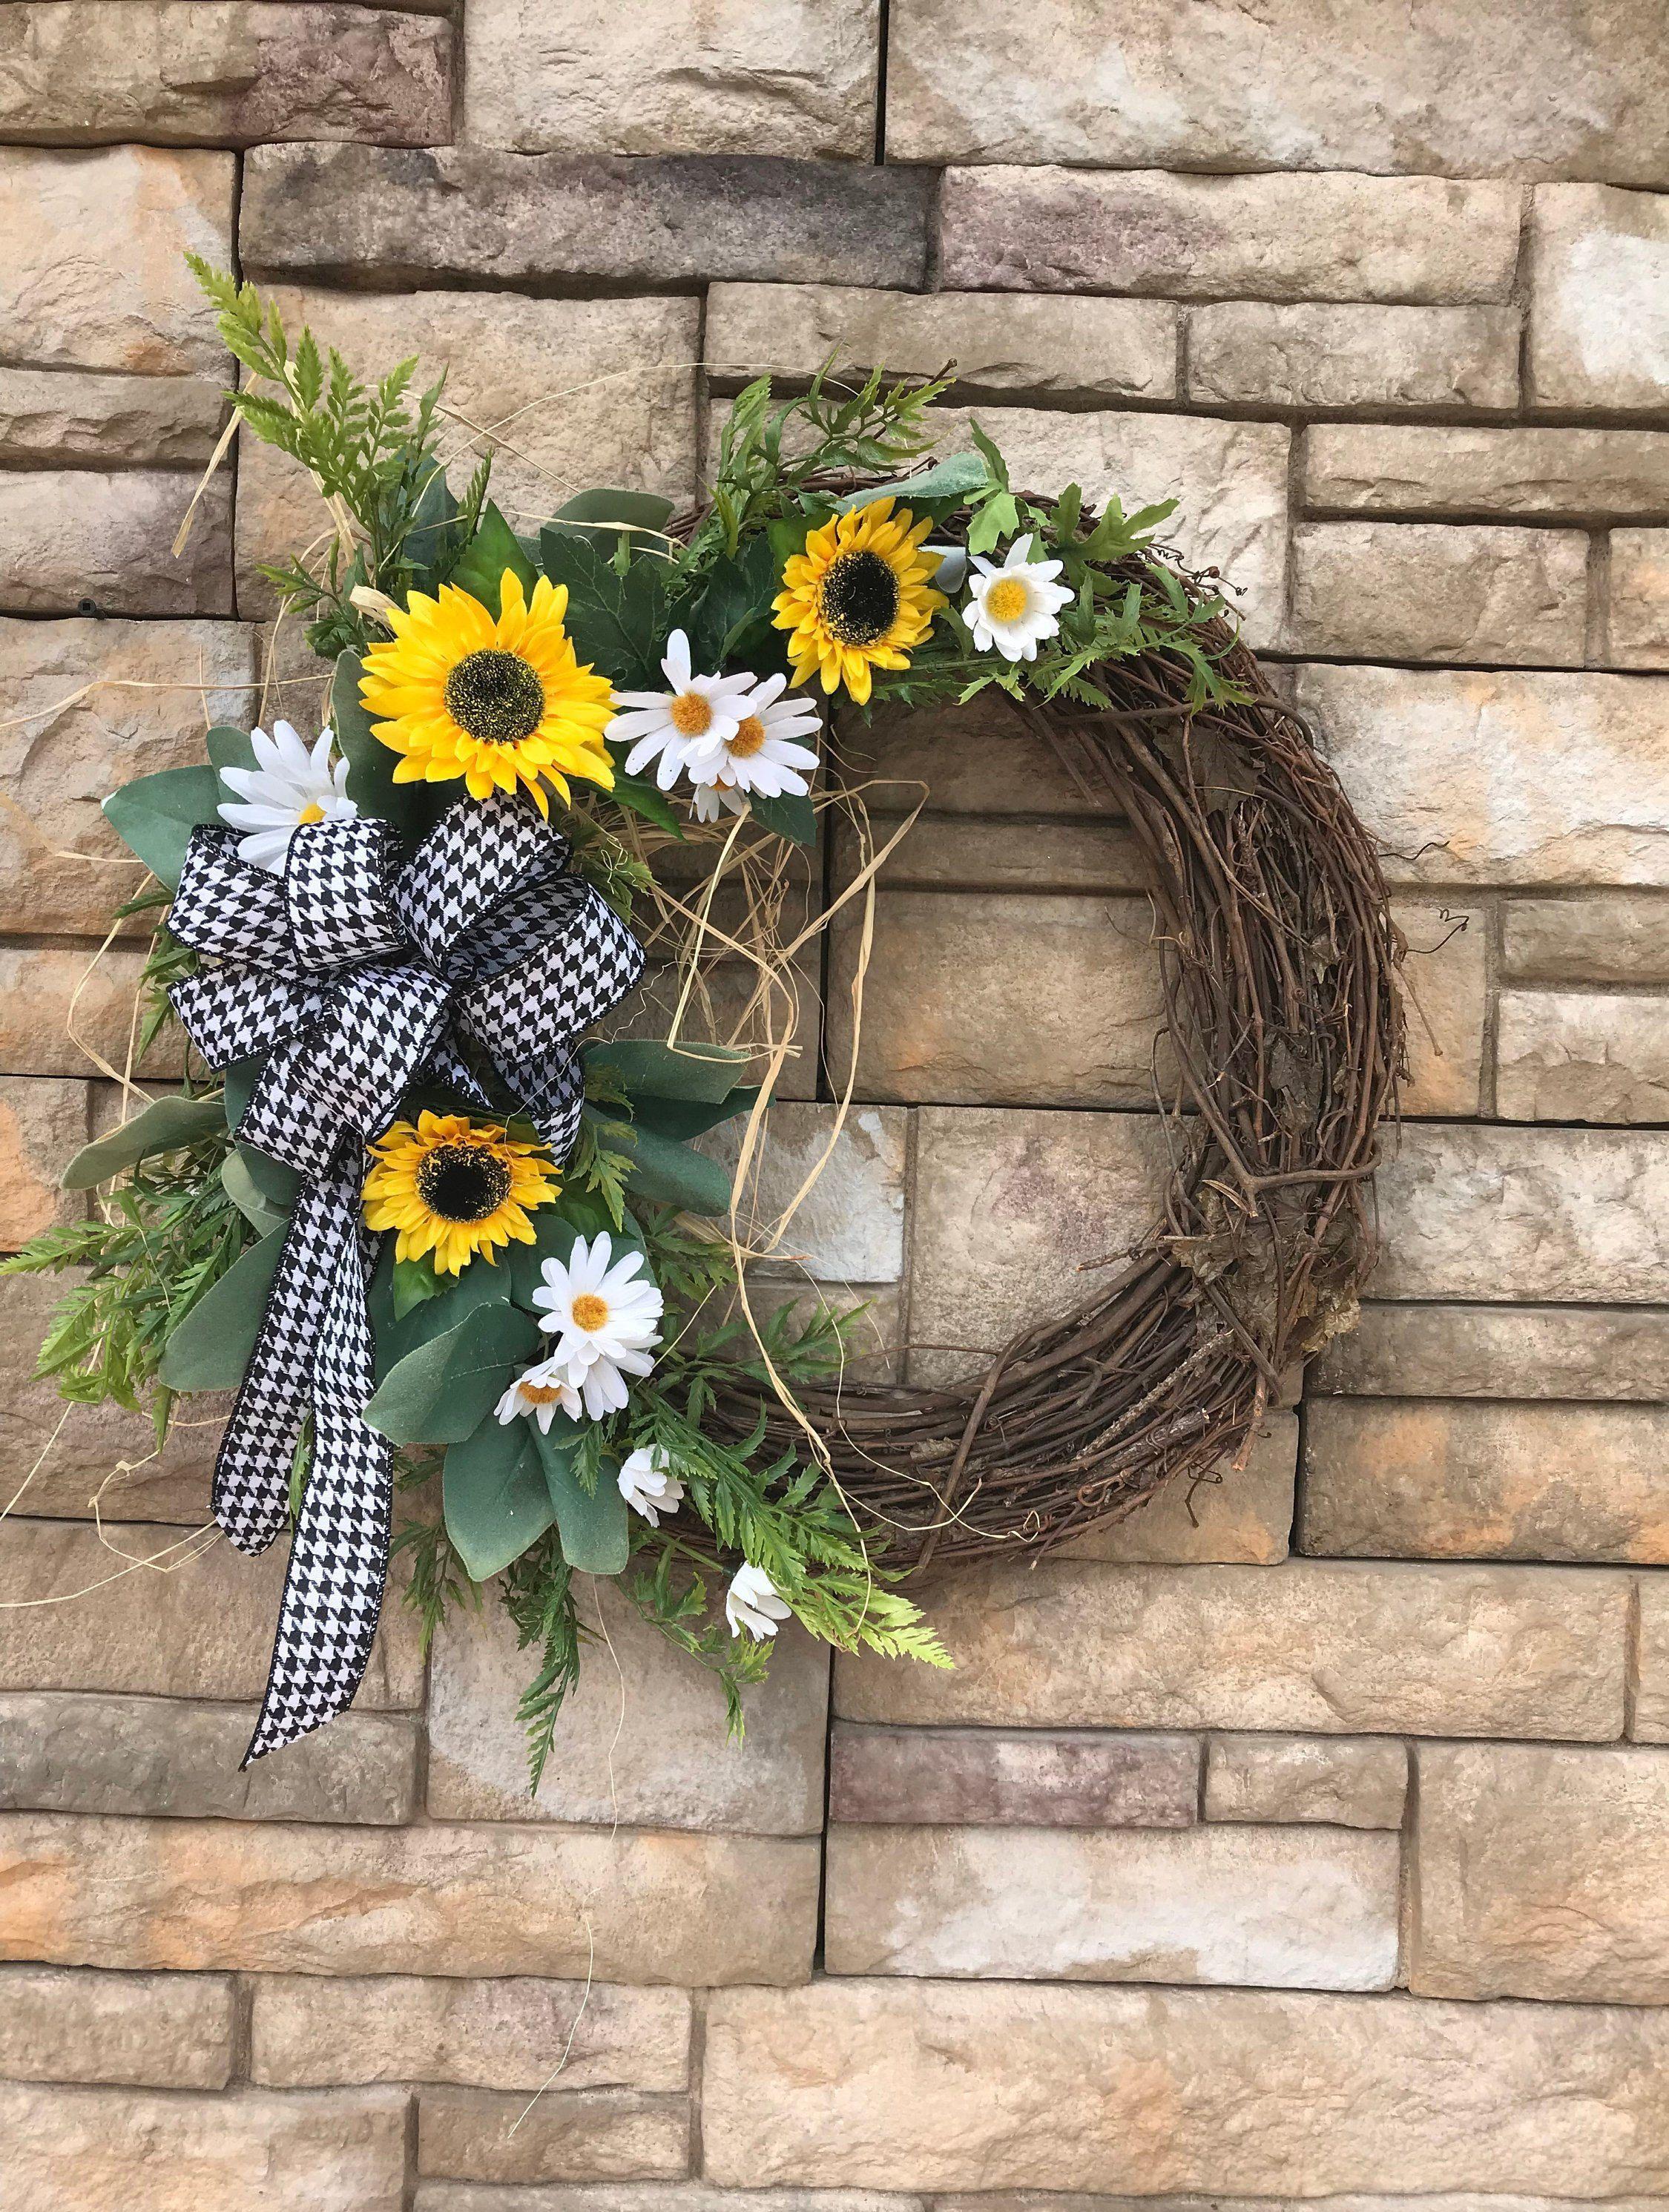 Photo of Daisies & Sunflower Farmhouse Wreath-Sunflower Silk Wreath-Daisy Front Door Wreath-Farmhouse Decor-Black and White Check Farmhouse Wreath